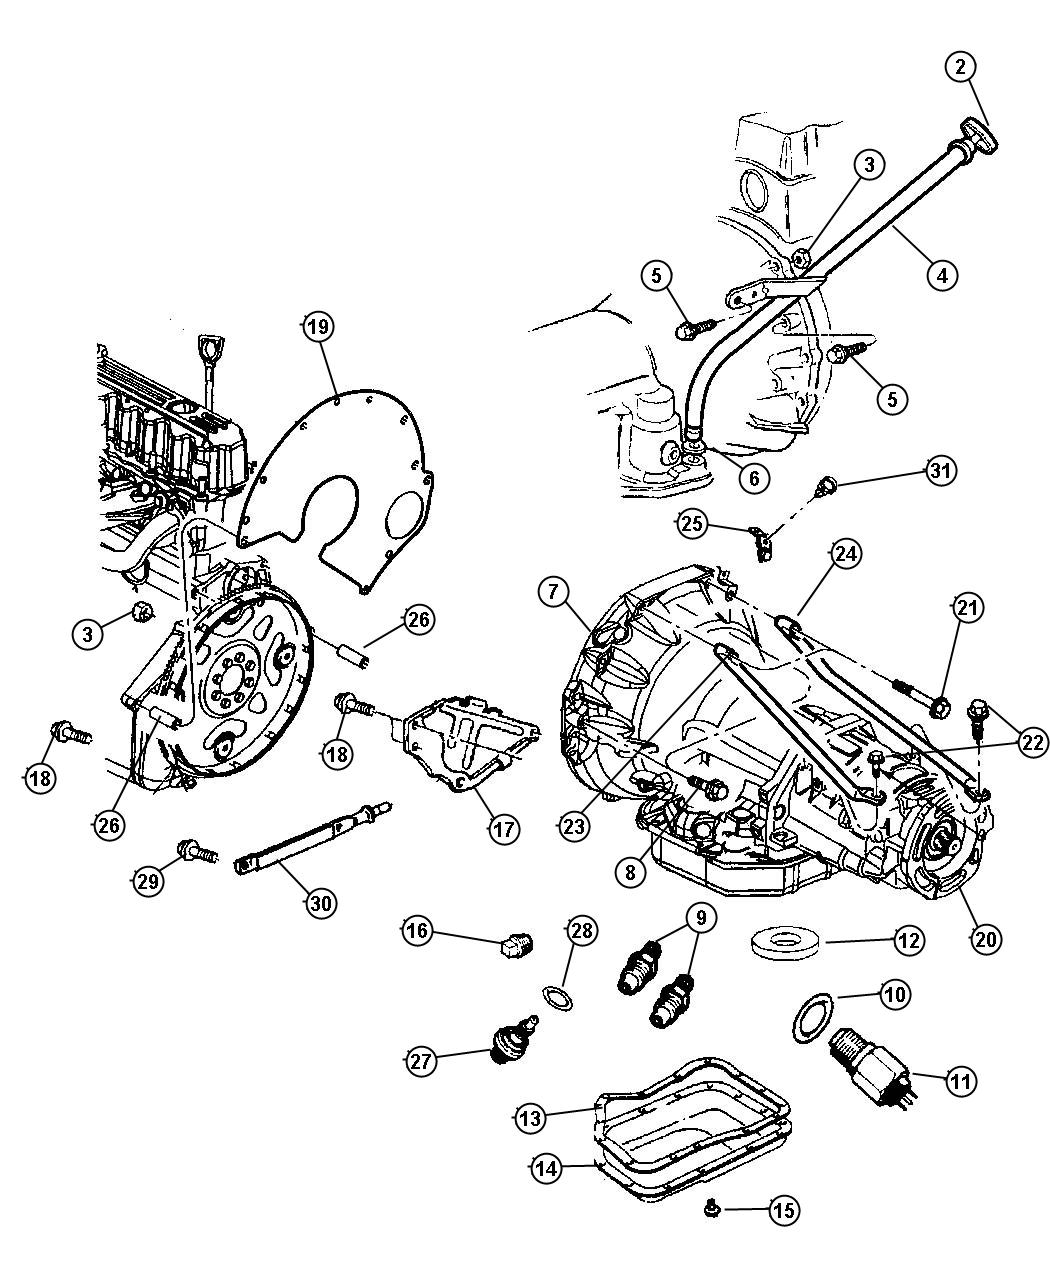 1999 Jeep Grand Cherokee Seal. Oil filler tube. Case